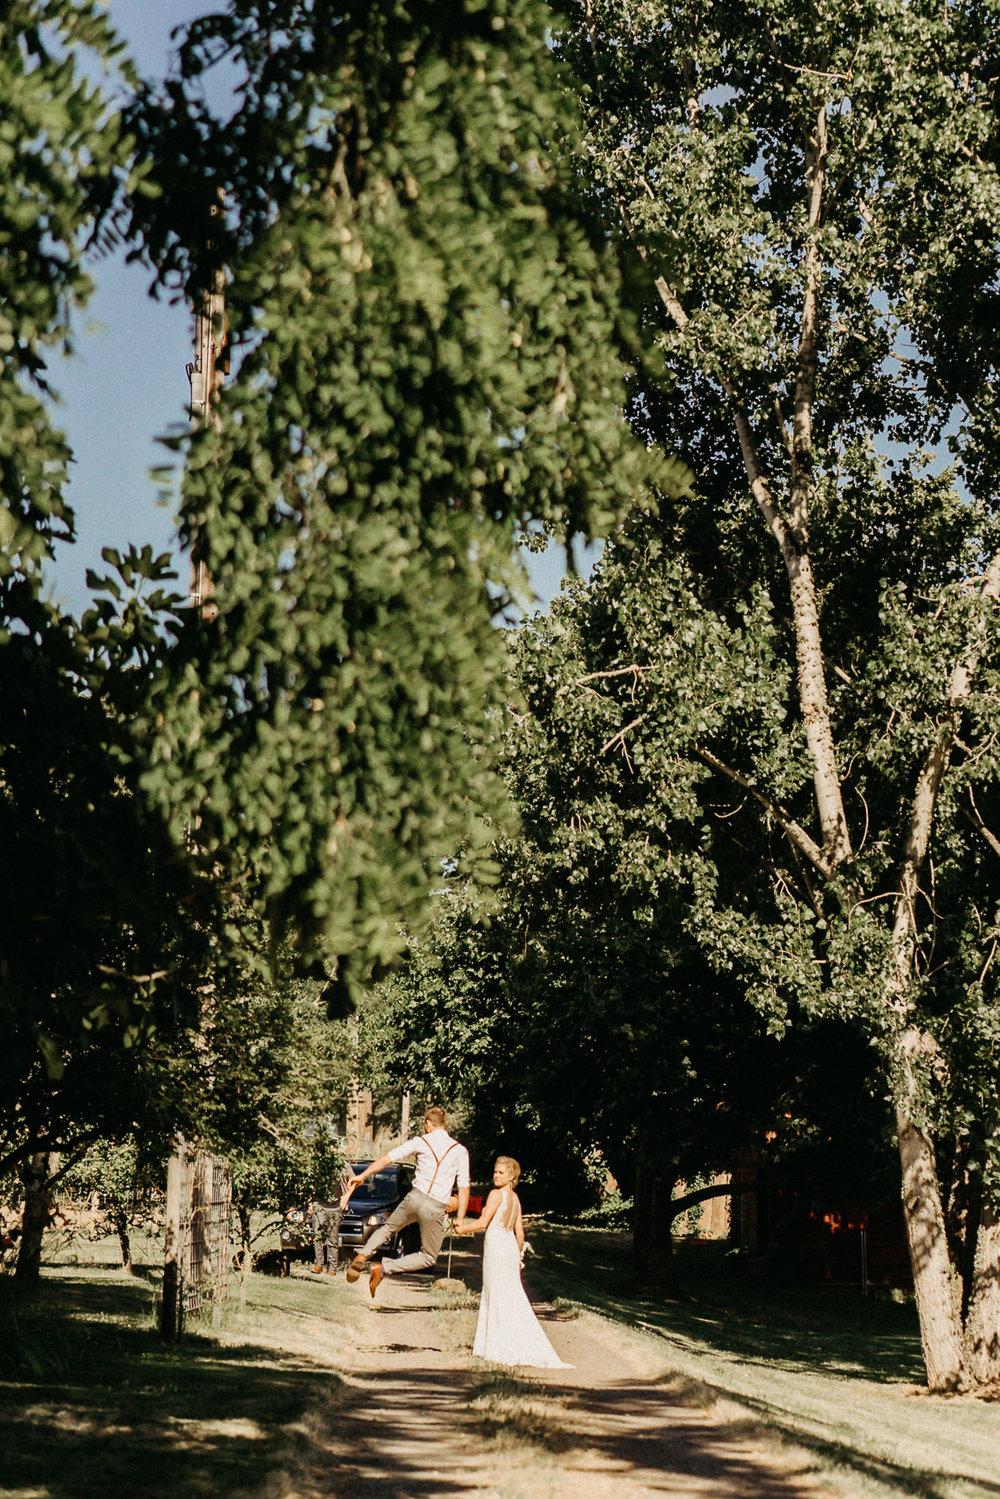 Summerhill-Farms-Portland-Wedding-Photographer-Backyard-Vineyard-54.jpg